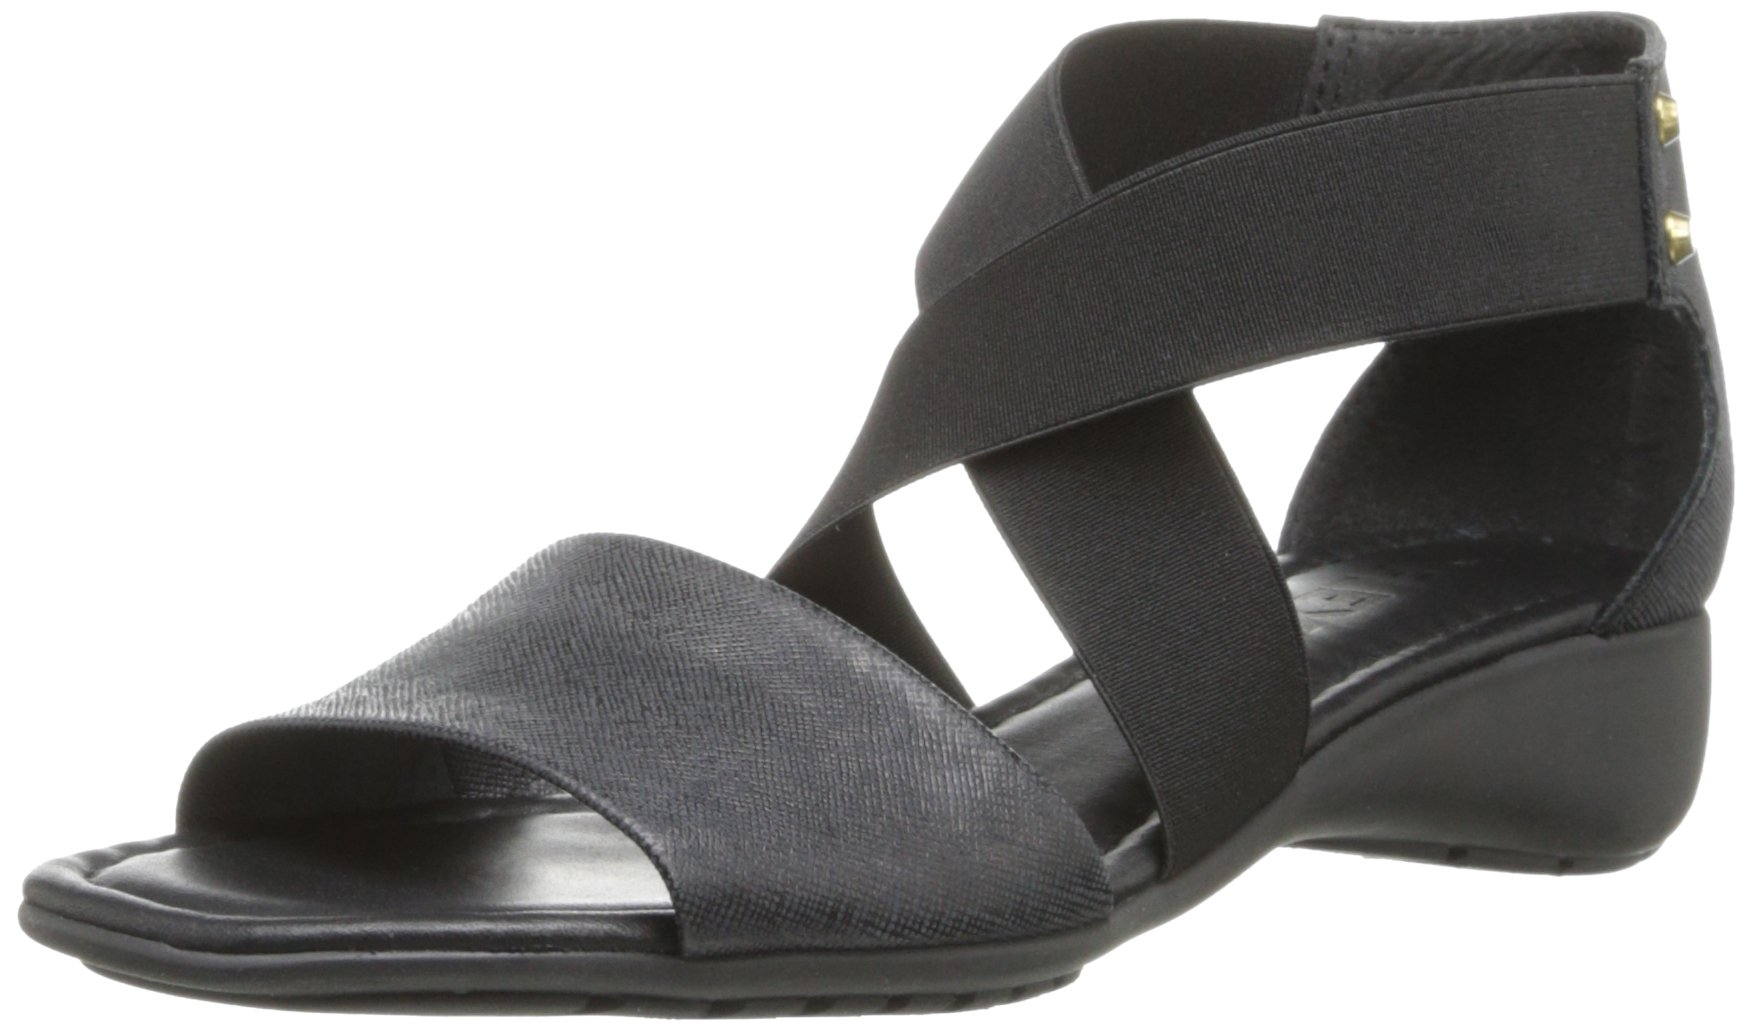 The Flexx Women's Sunglass Wedge Sandal,Black,9.5 M US